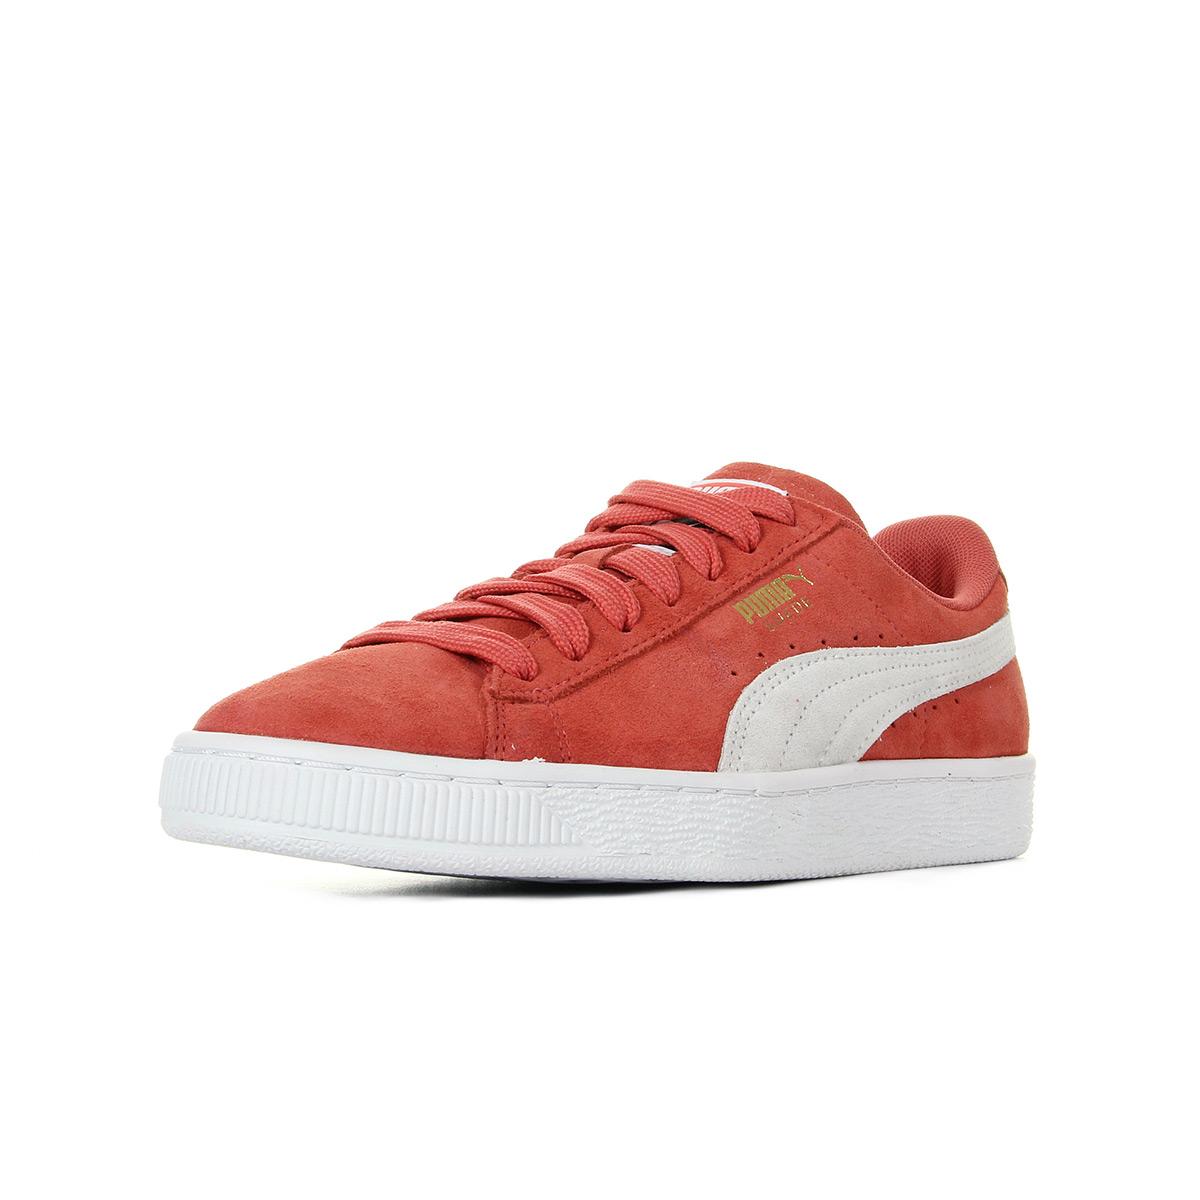 taille 40 edd02 eb4ea Puma Suede Classic W's 35546260, Baskets mode femme